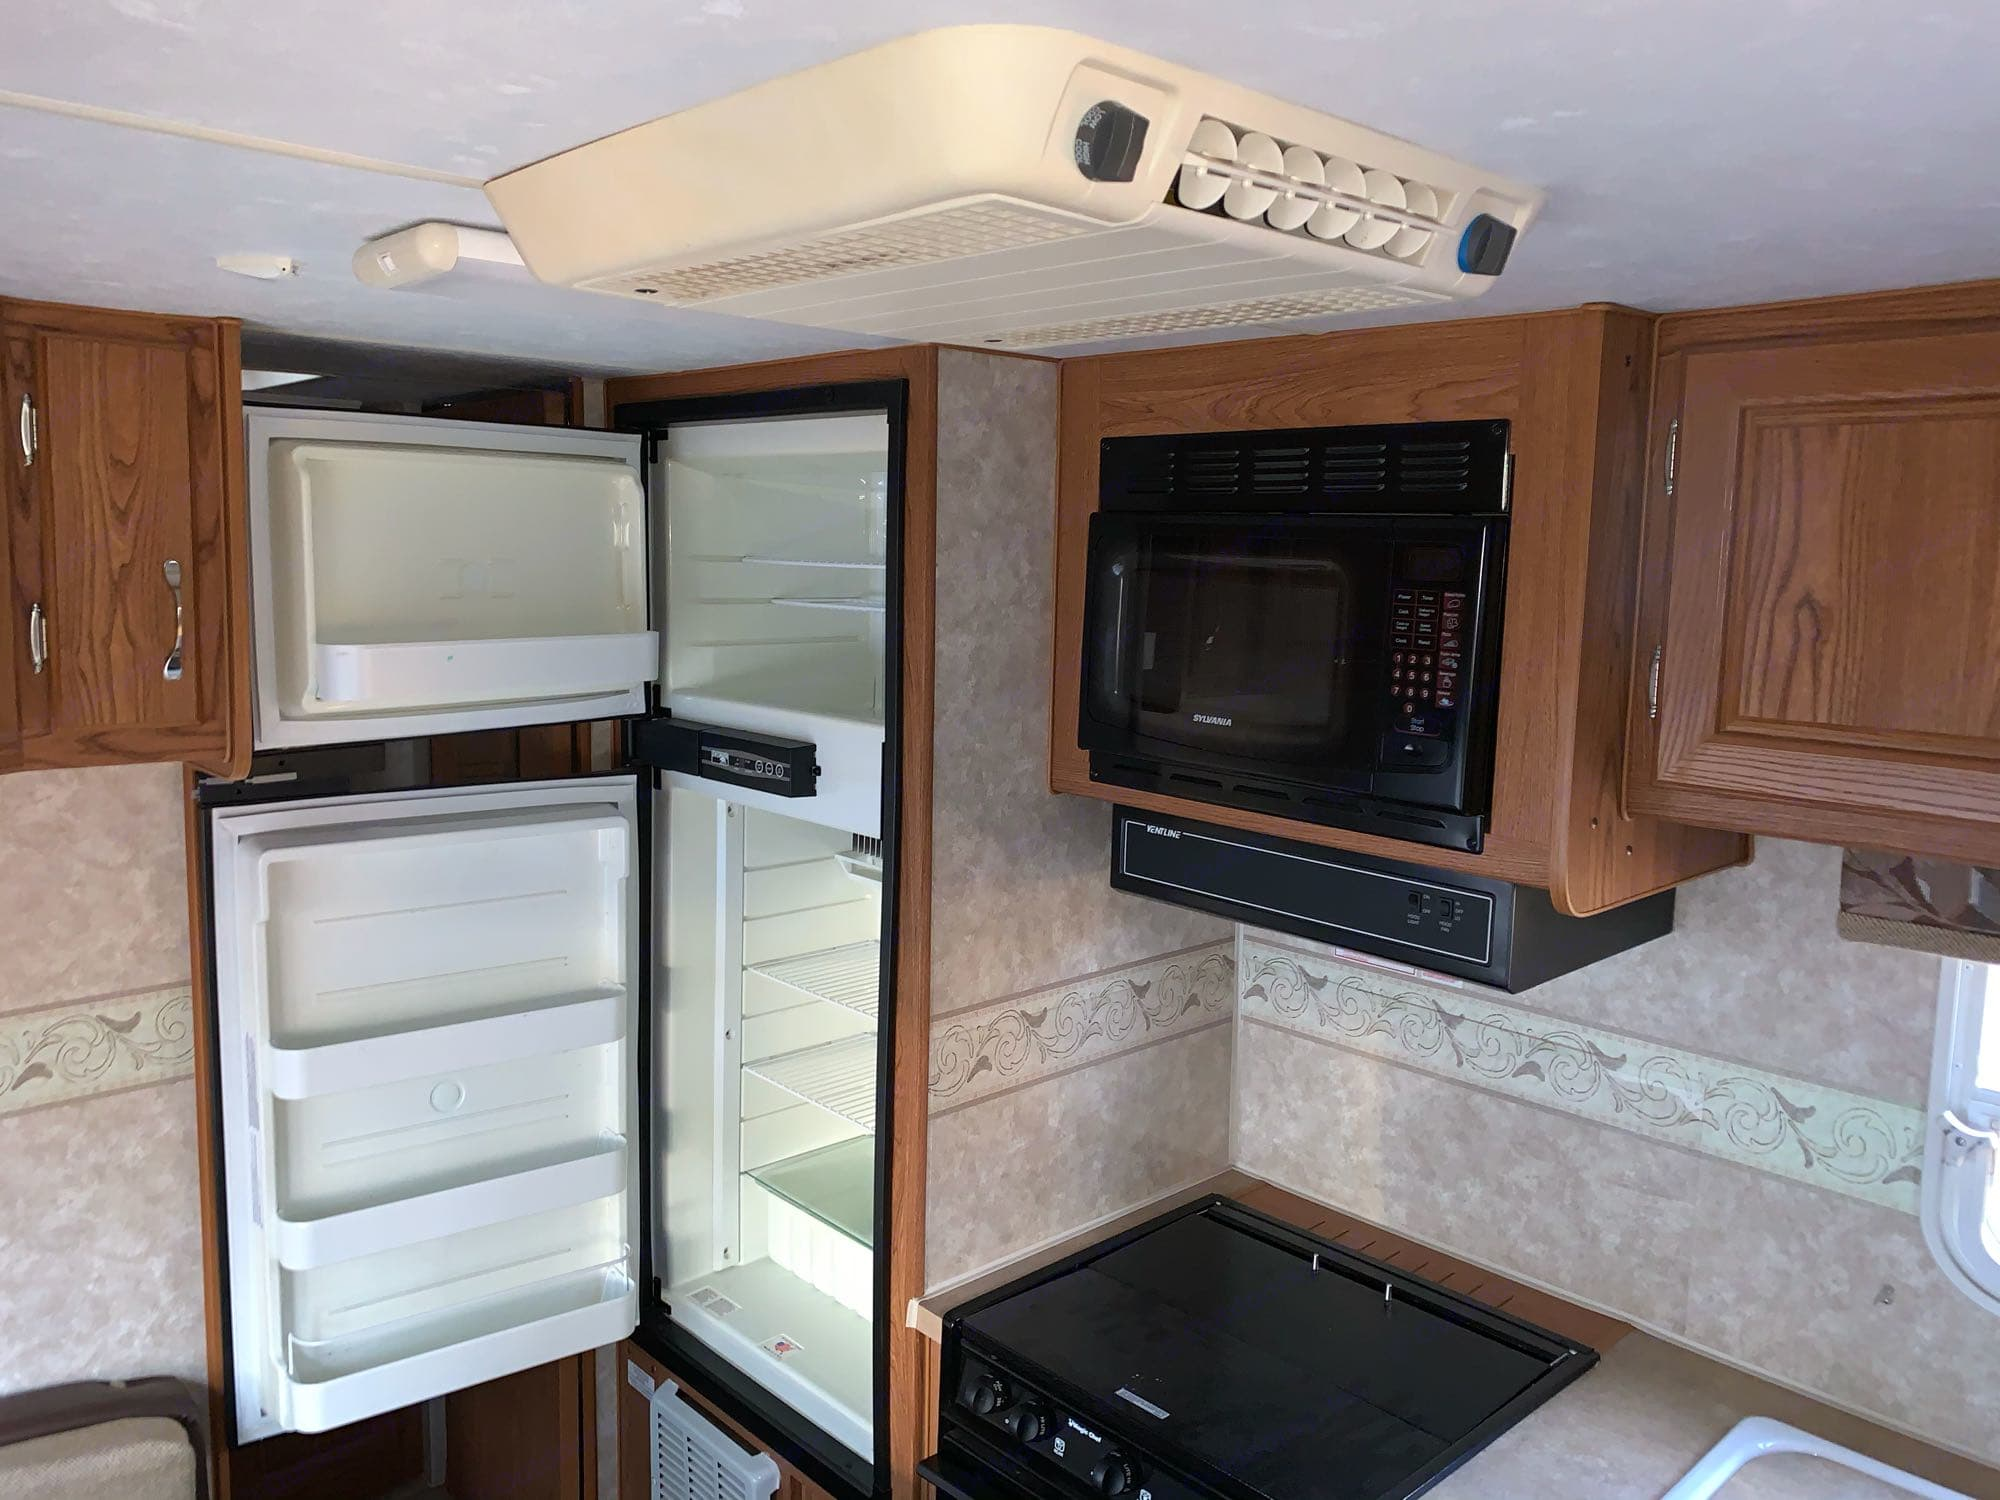 microwave, stove, frig and freezer. AC as well. Northwood Mfg Nash 2009